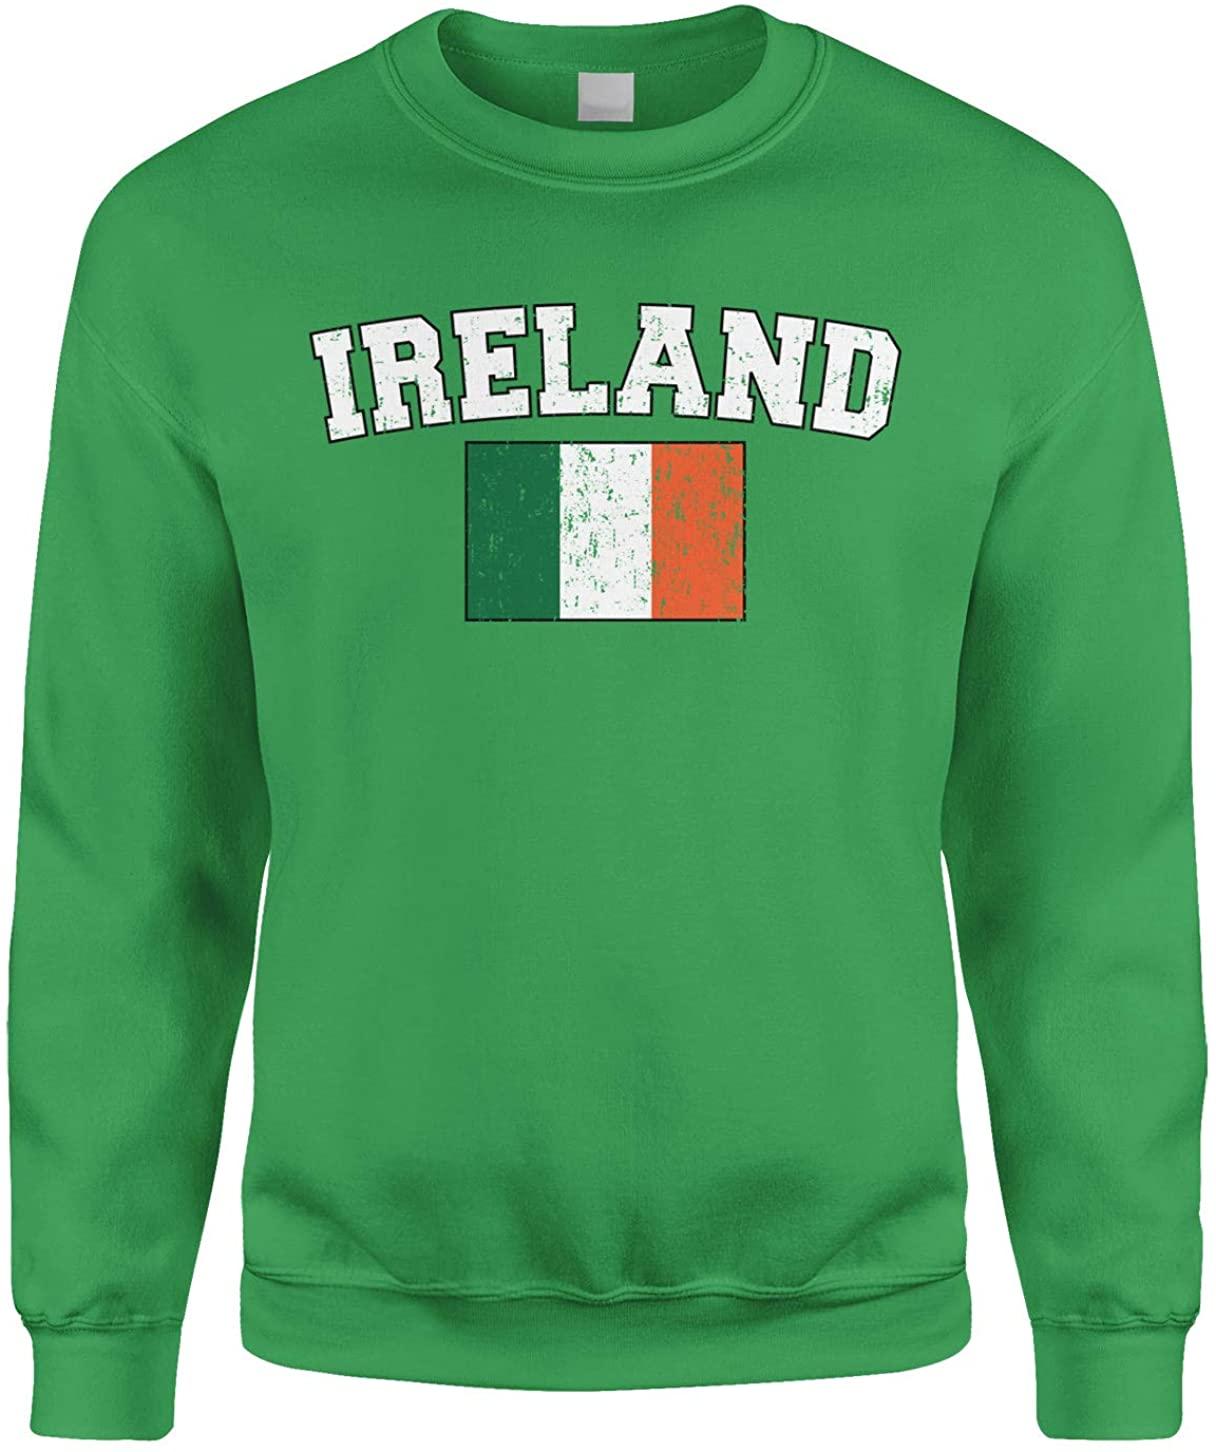 Cybertela Faded Distressed Irish Ireland Flag Crewneck Sweatshirt